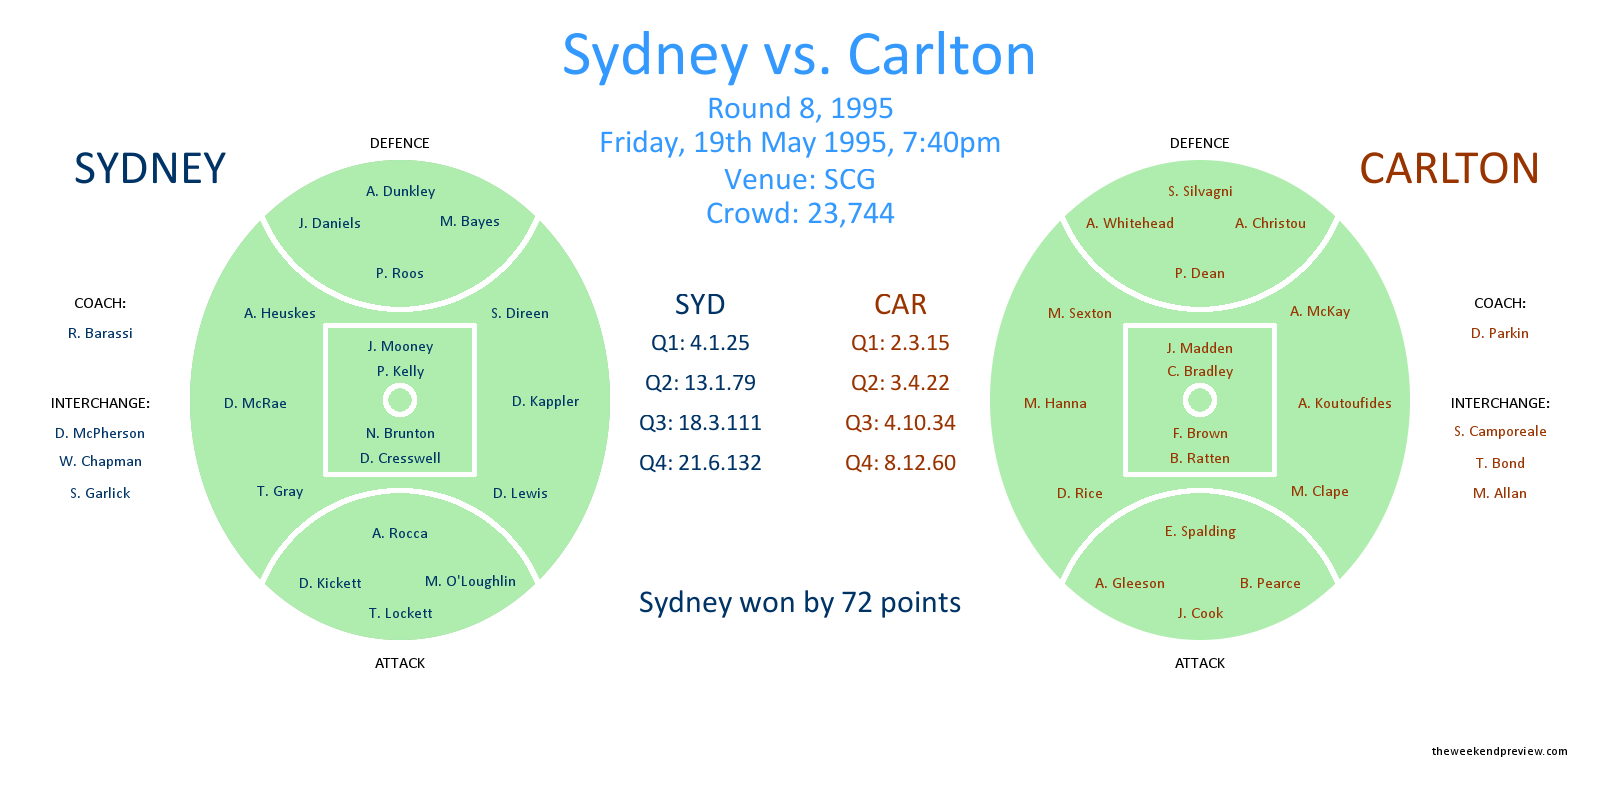 Figure-1: Round 8, 1995 – Sydney vs. Carlton